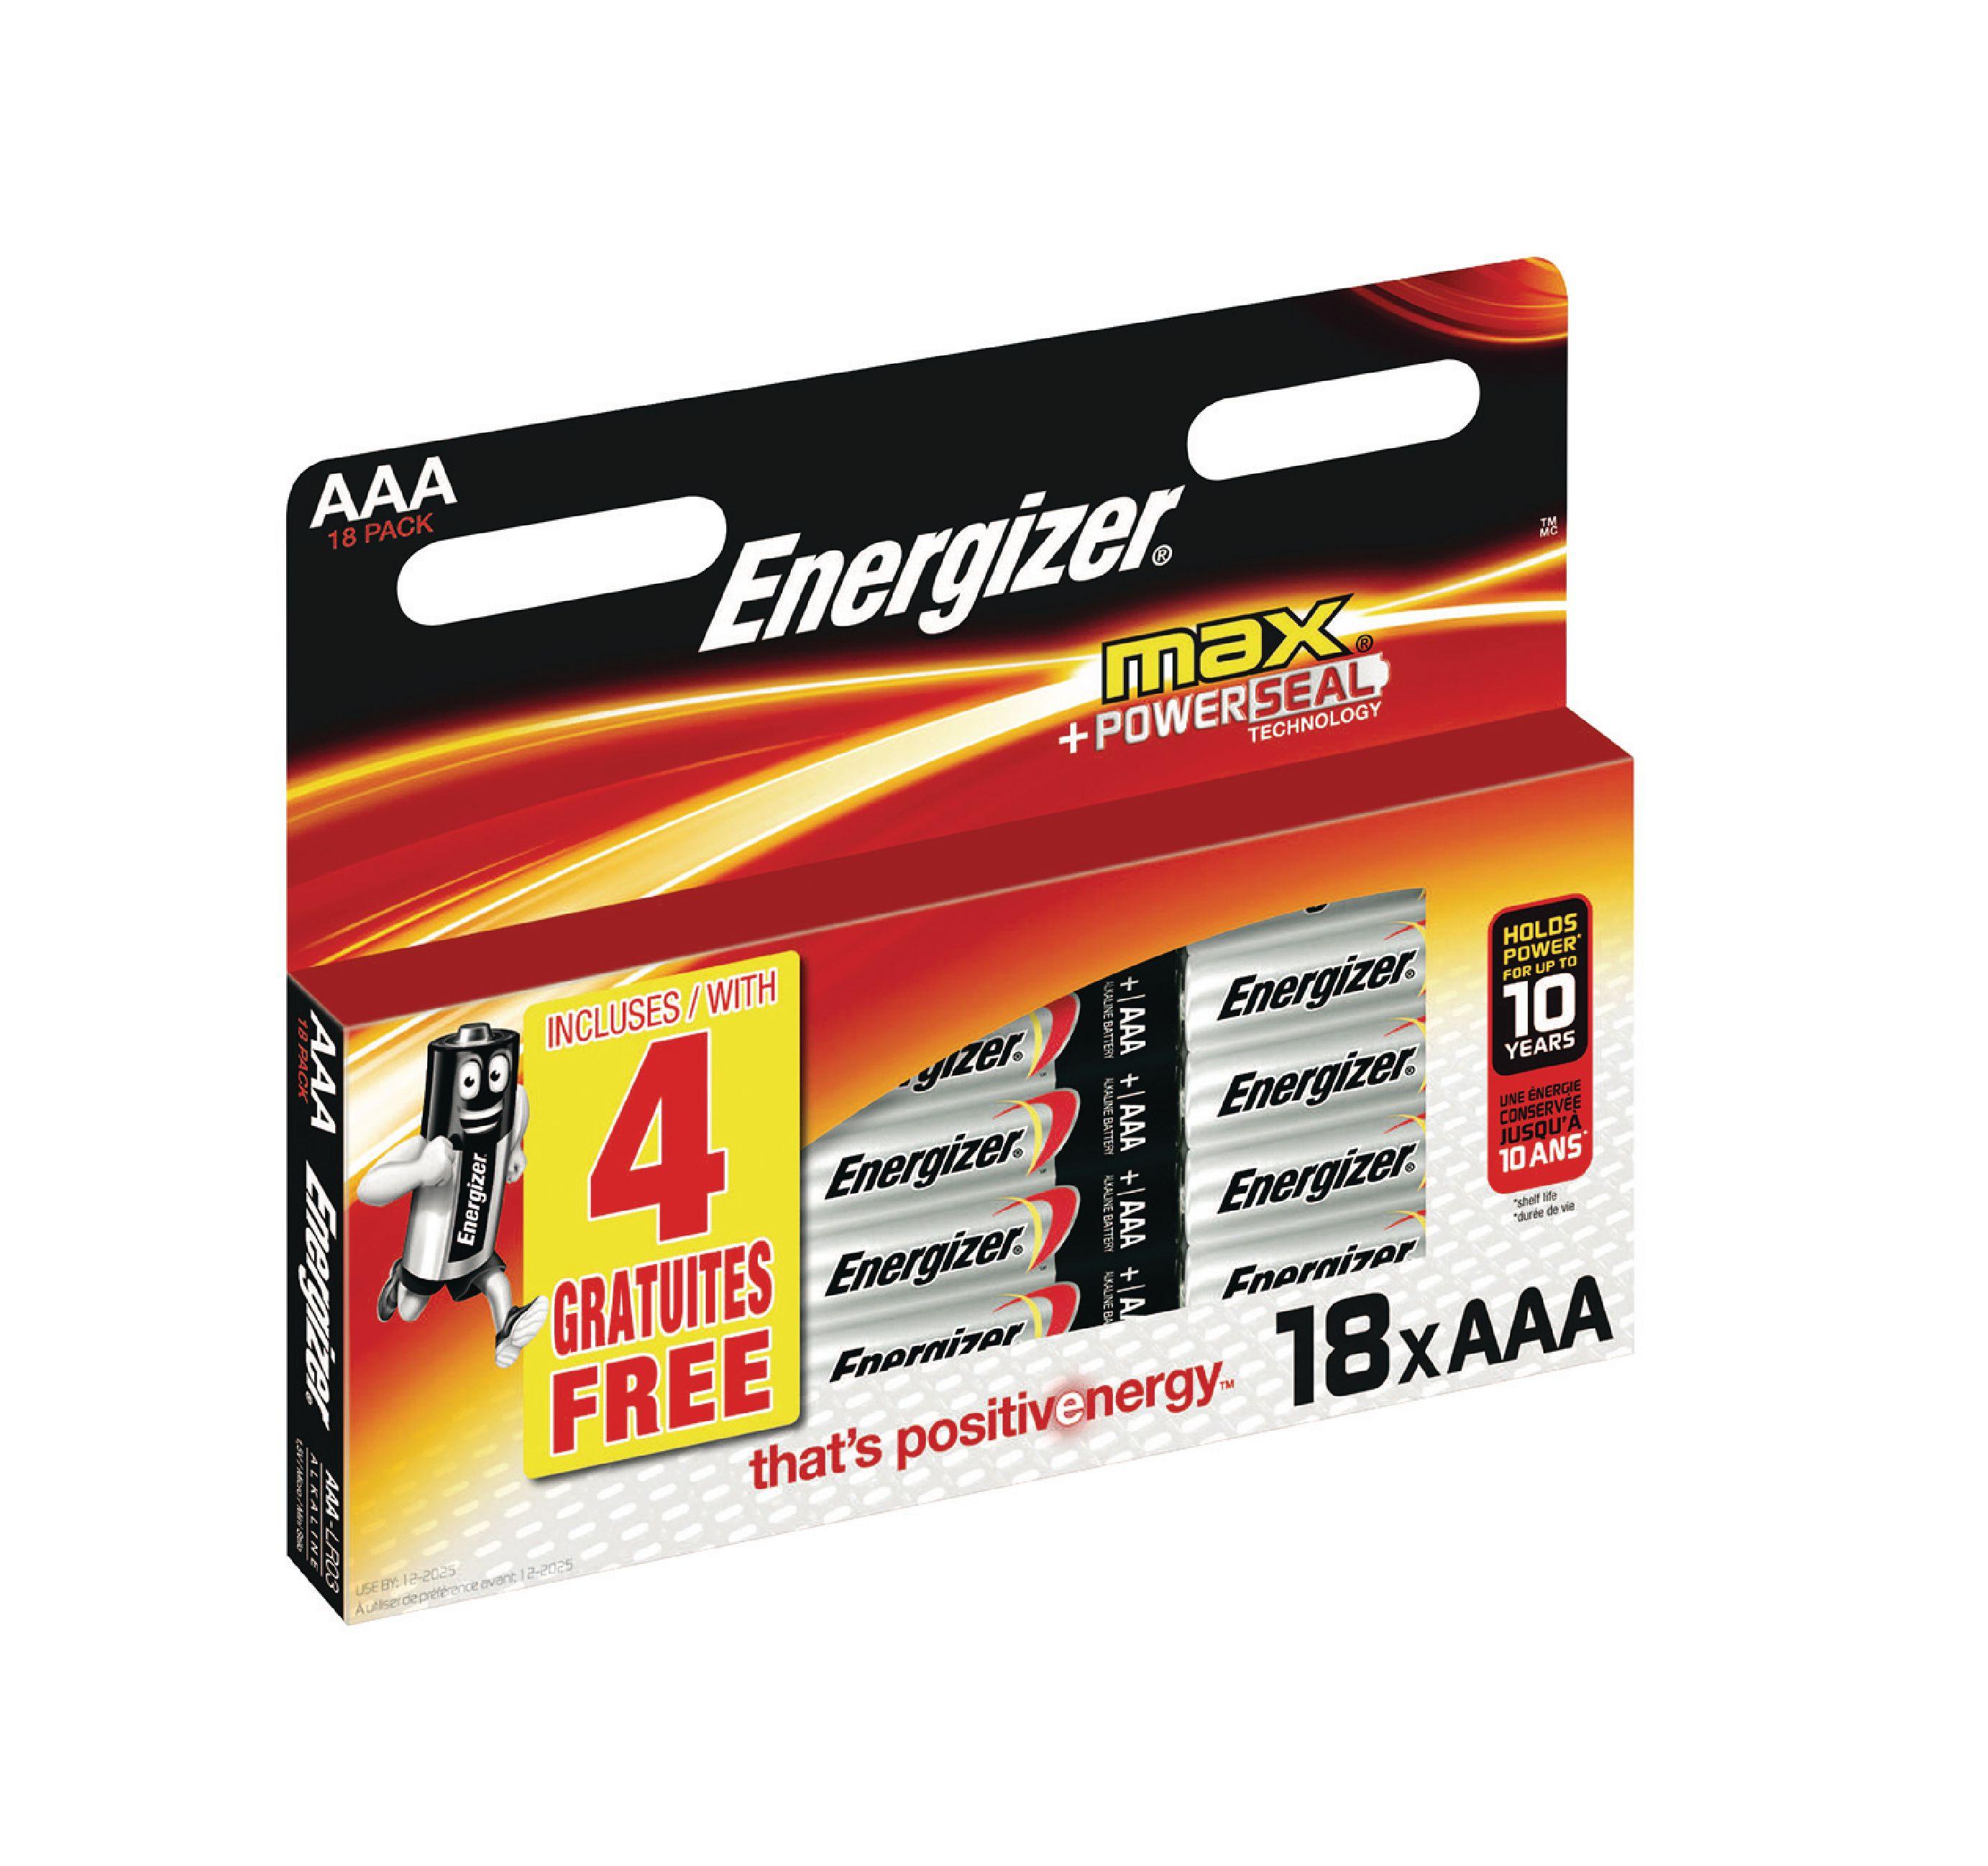 Alkalická baterie Energizer Max AAA 1.5V, 18ks, EN-53541412700